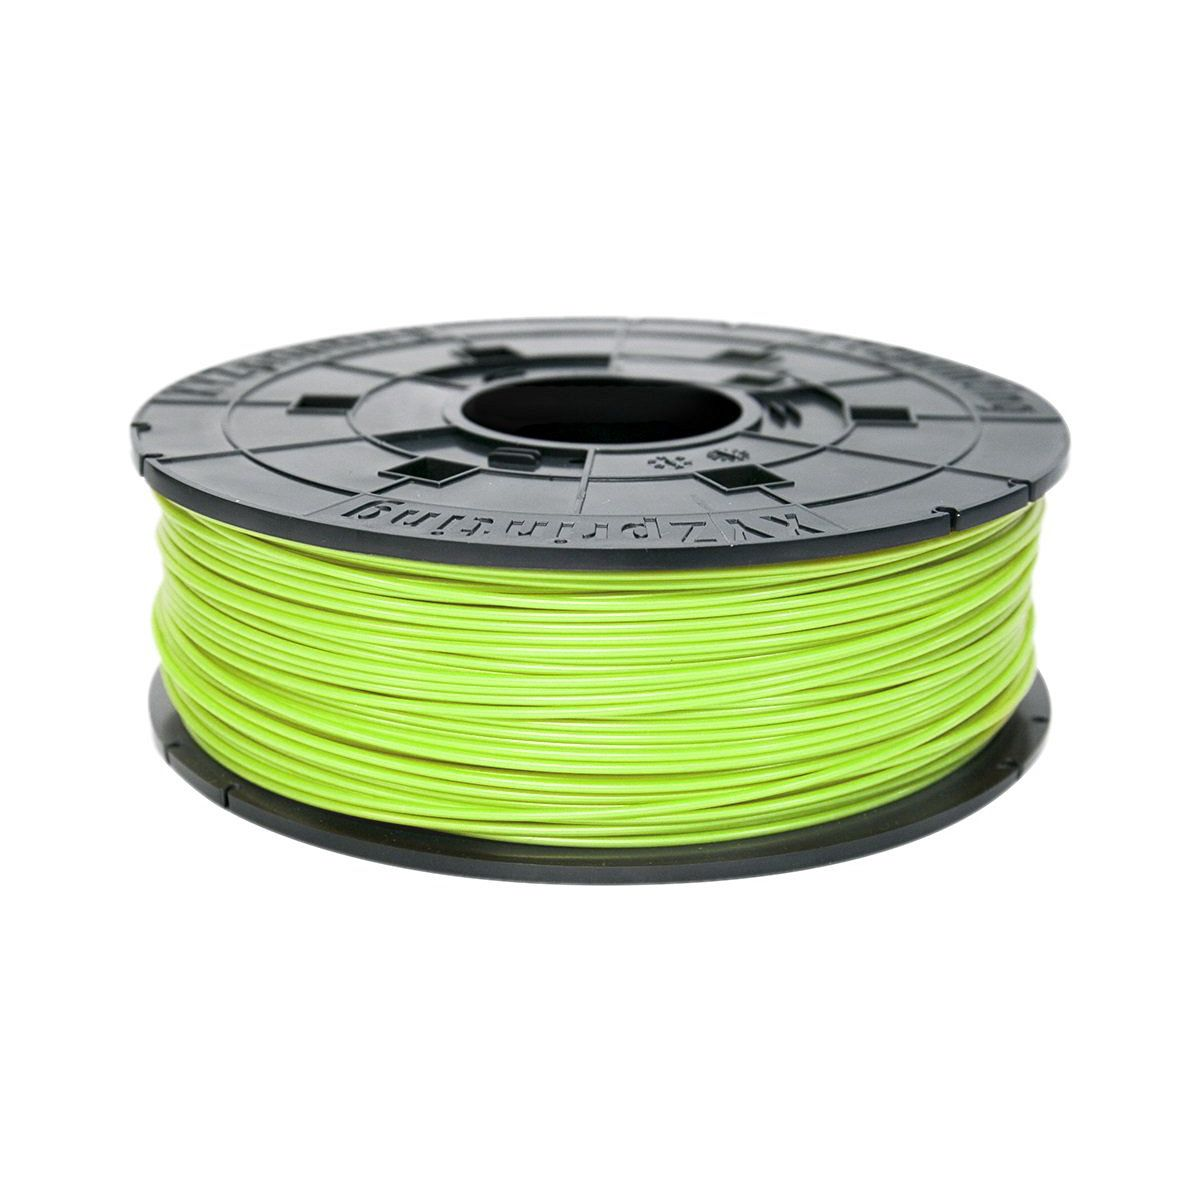 Filament 3D XYZ PRINTING Filament PLA Néon vert